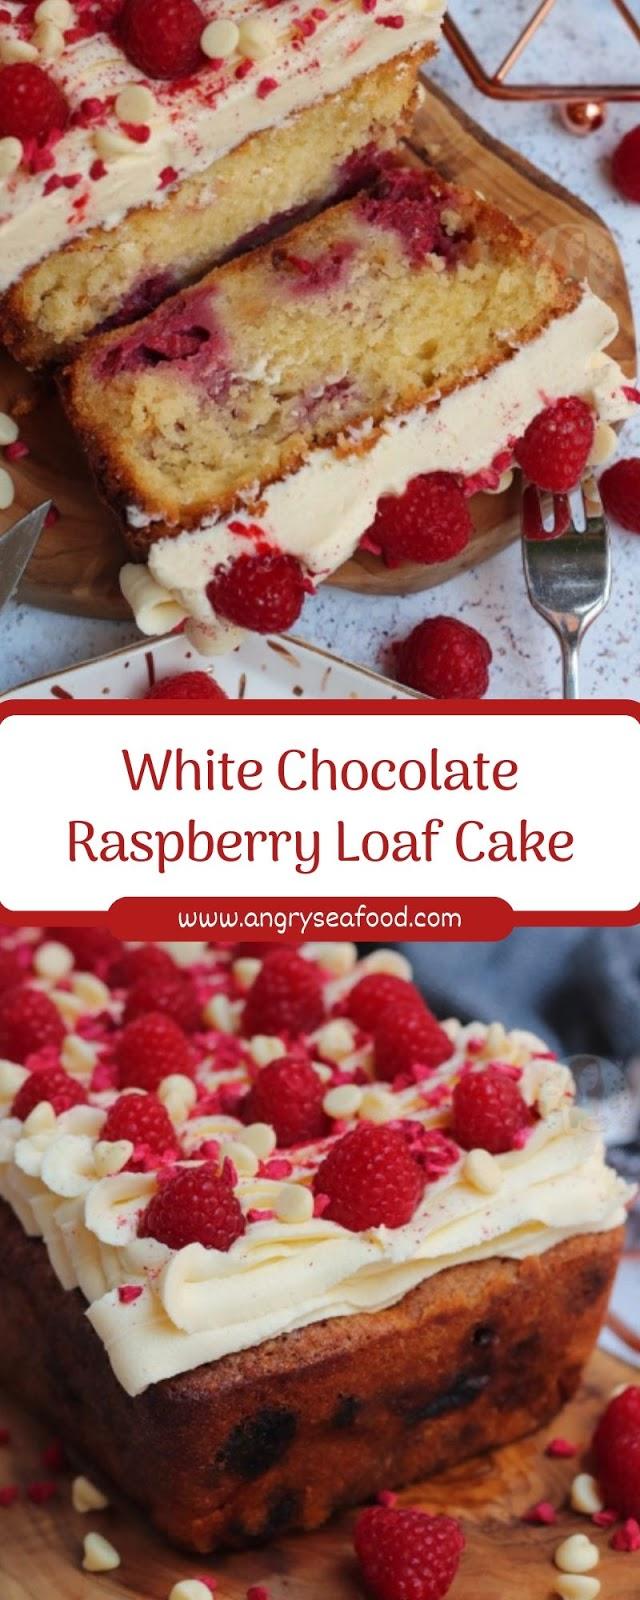 White Chocolate Raspberry Loaf Cake